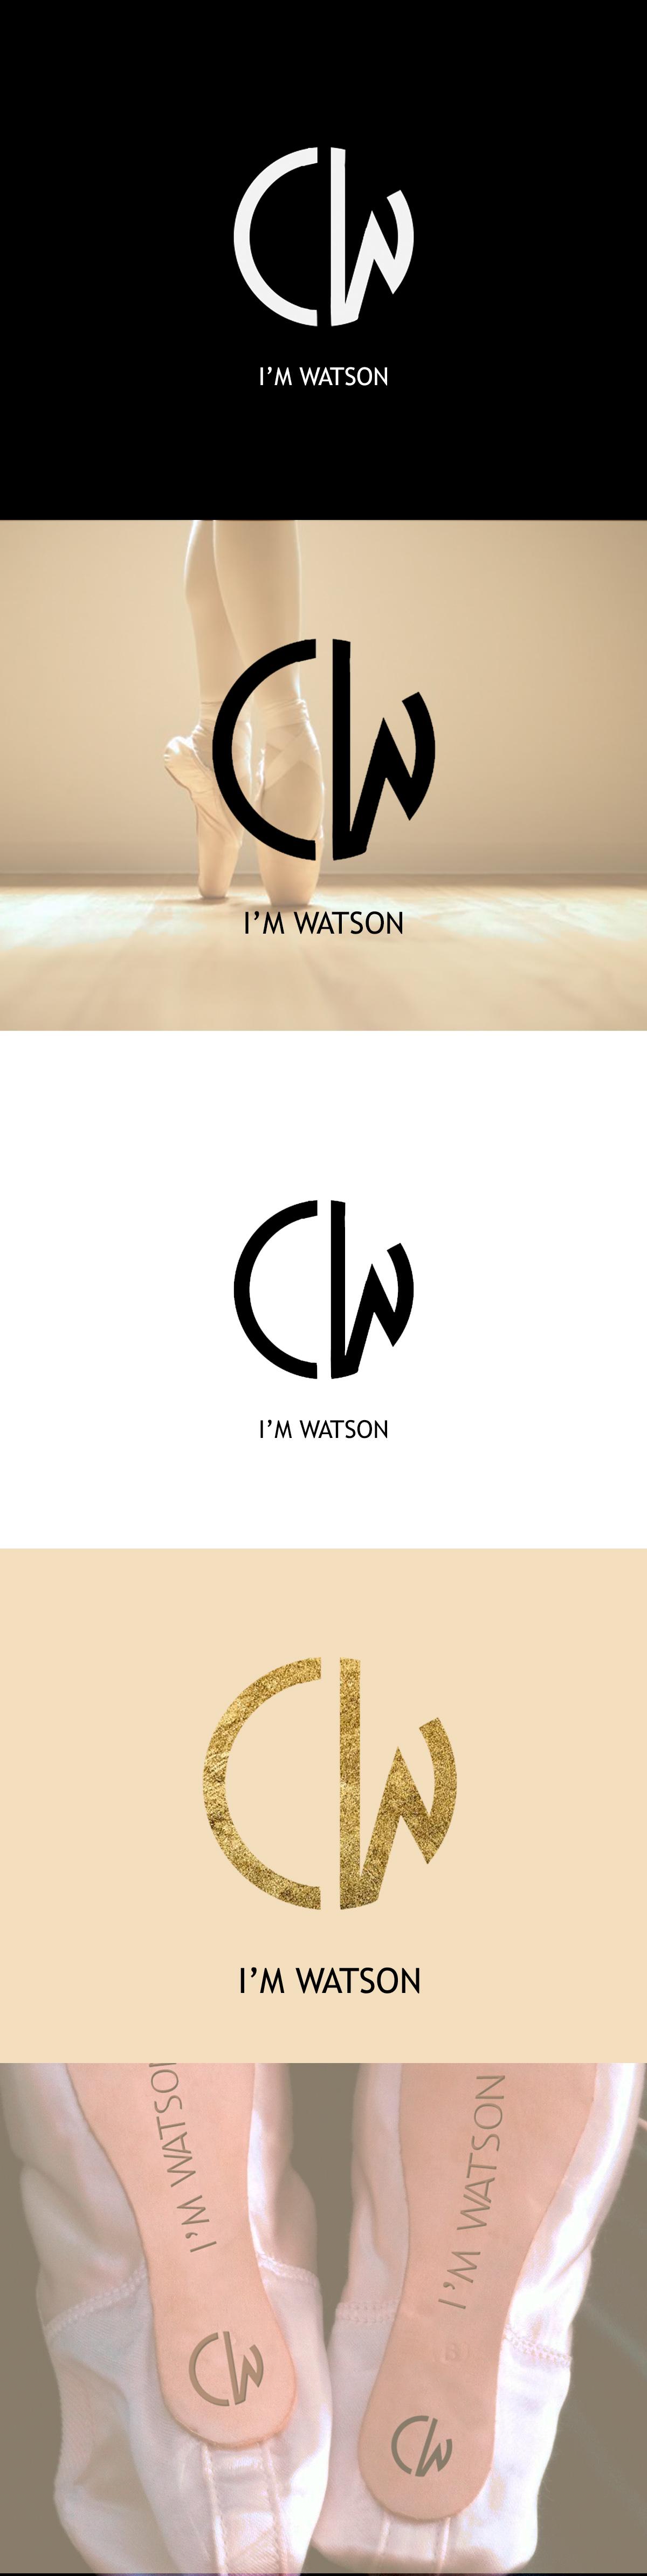 Разработать логотип для балетного бренда фото f_5715bc4fba409ba7.jpg